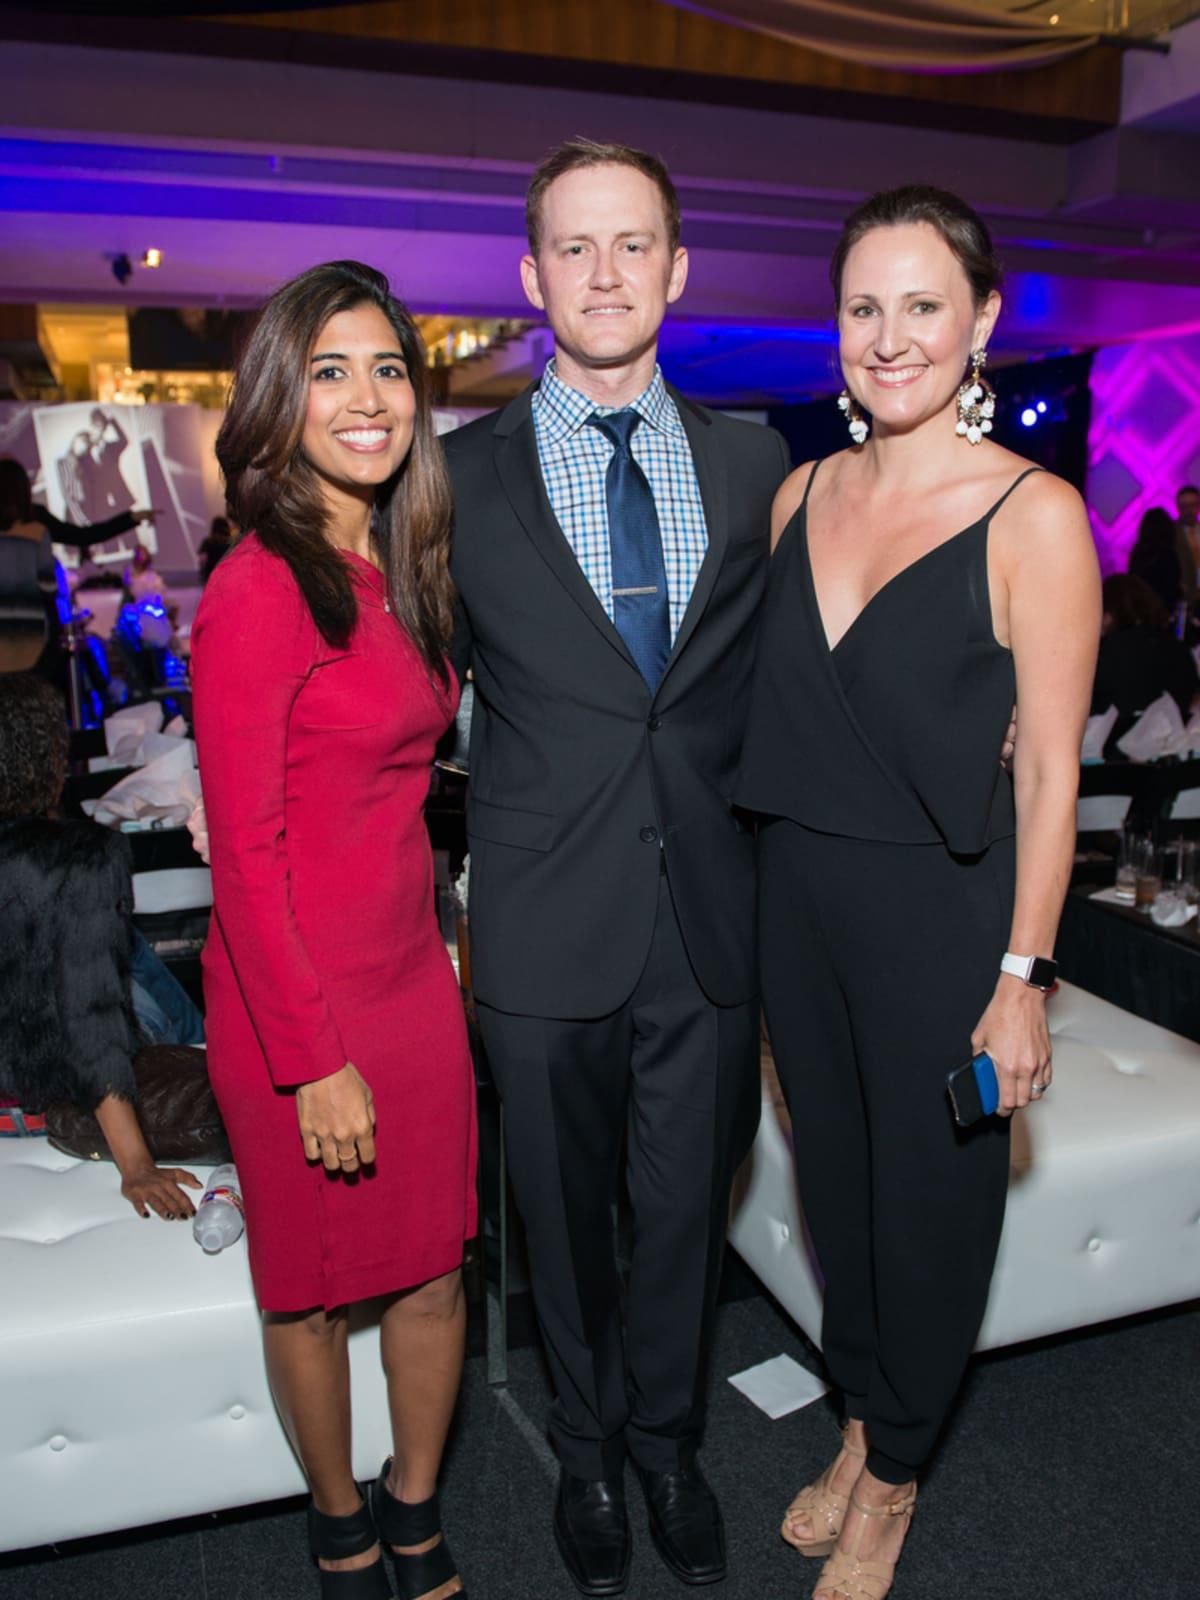 Houston, Vogue Simon Fashion Show, September 2015, Divya Brown, Cain Linville, Kate Stukenberg